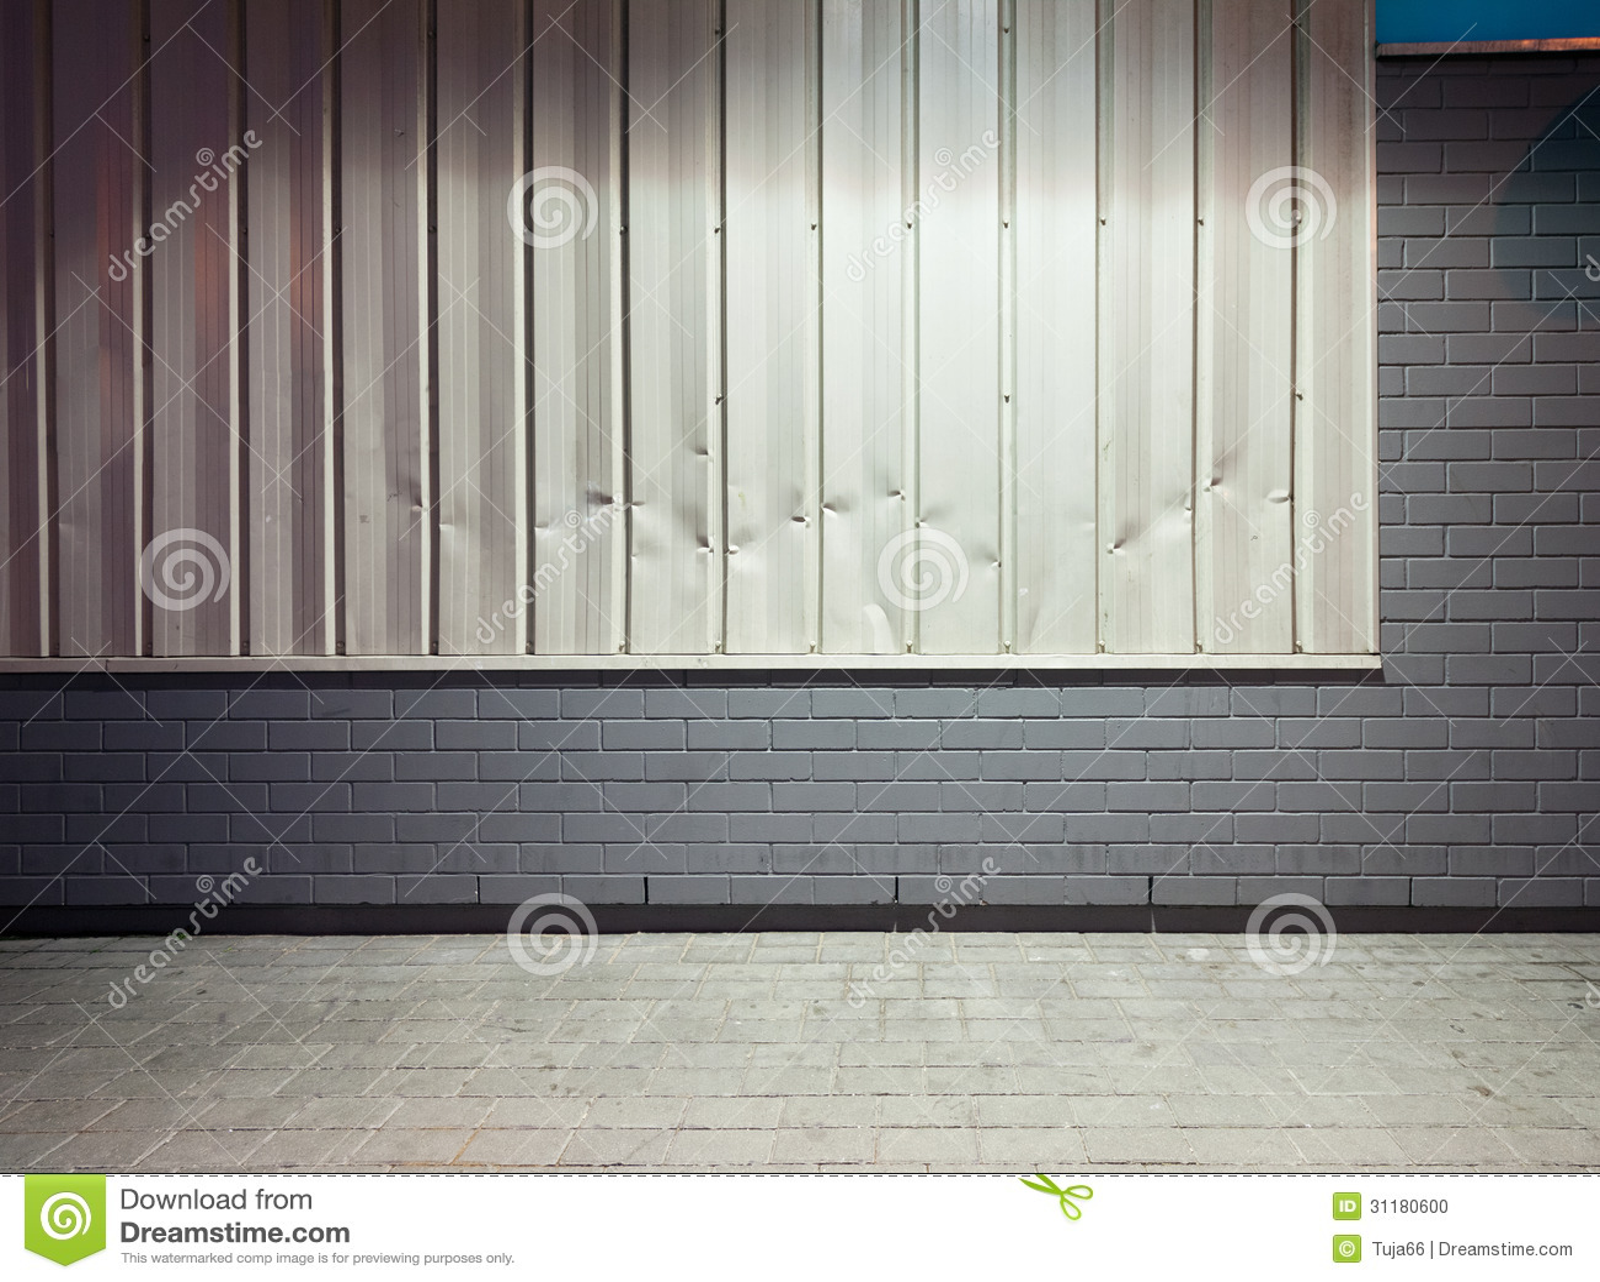 Wall Stock Photo - Image: 31180600